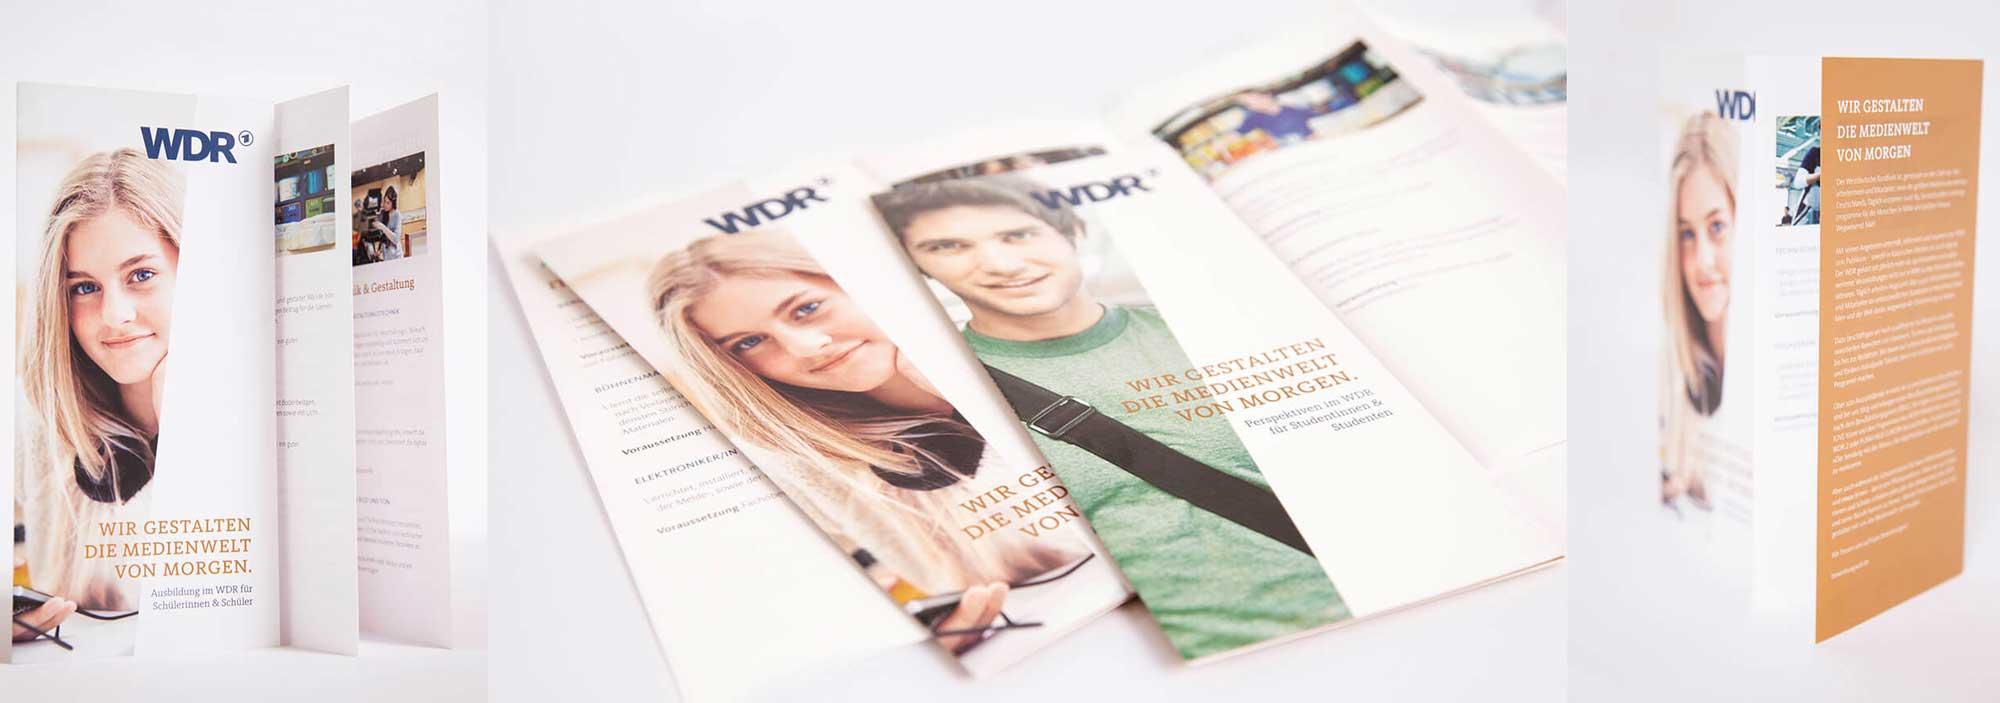 Recruiting Flyer Design Medienberufe